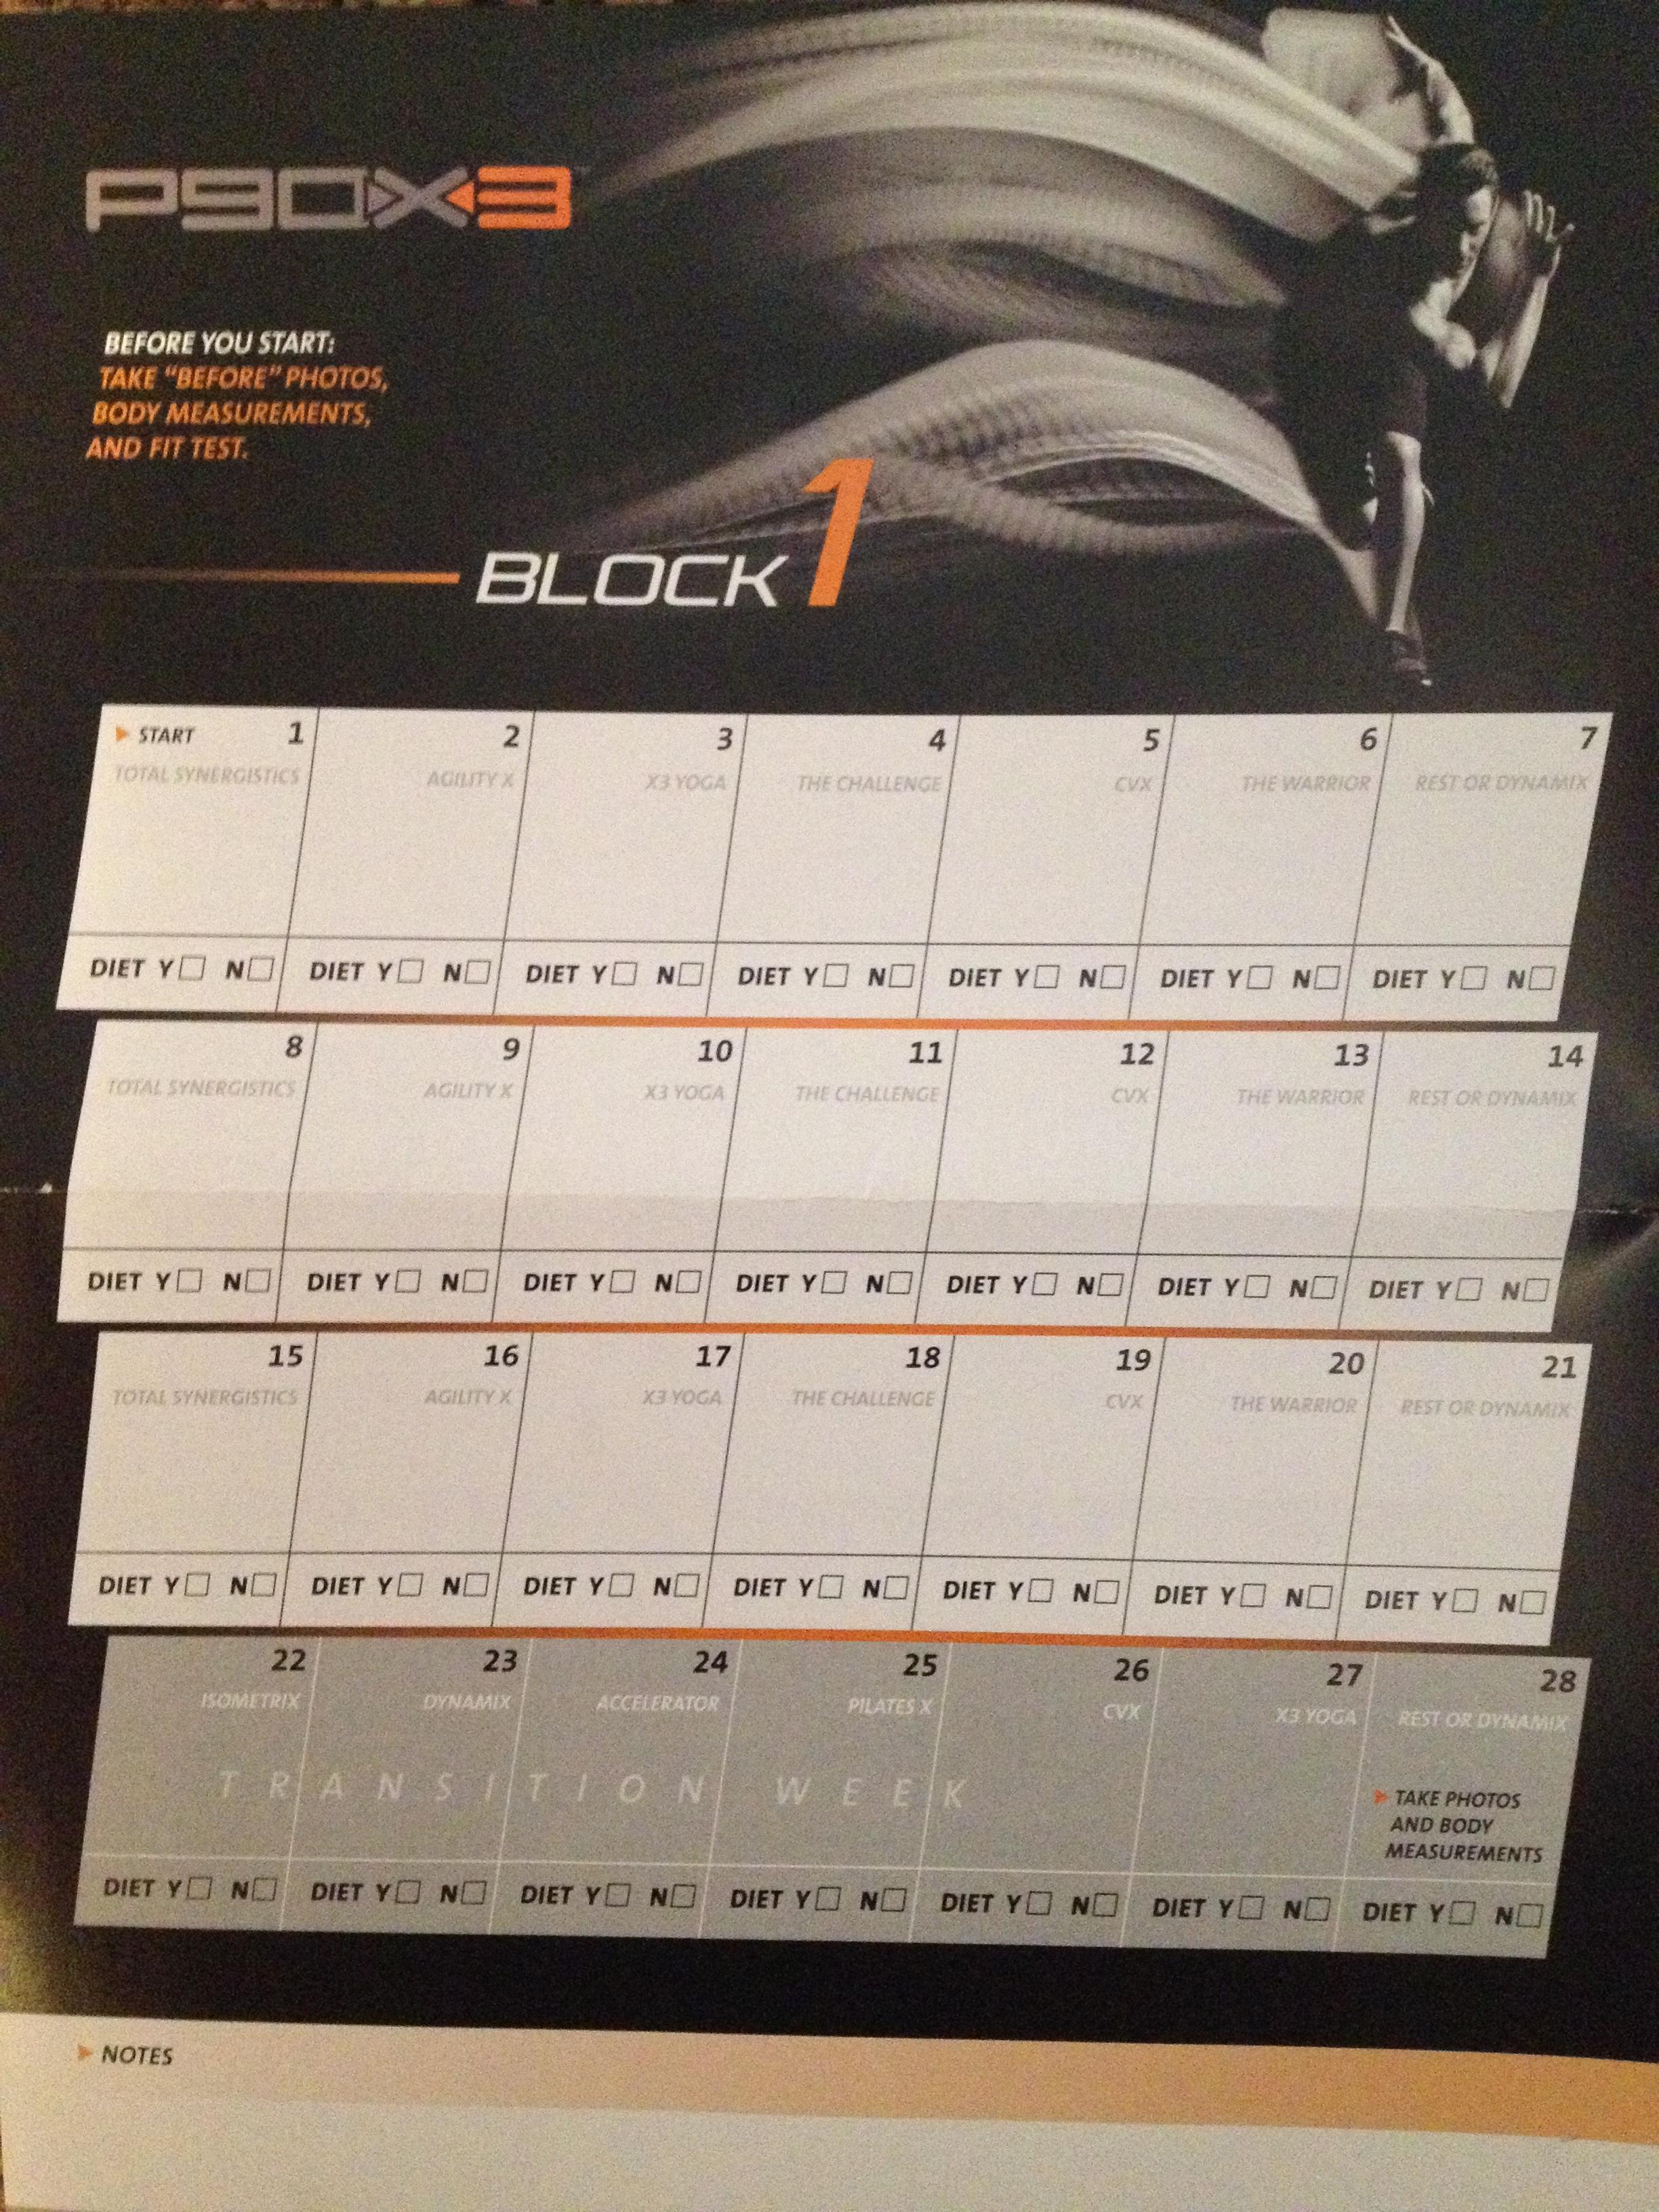 p90x3 calendar